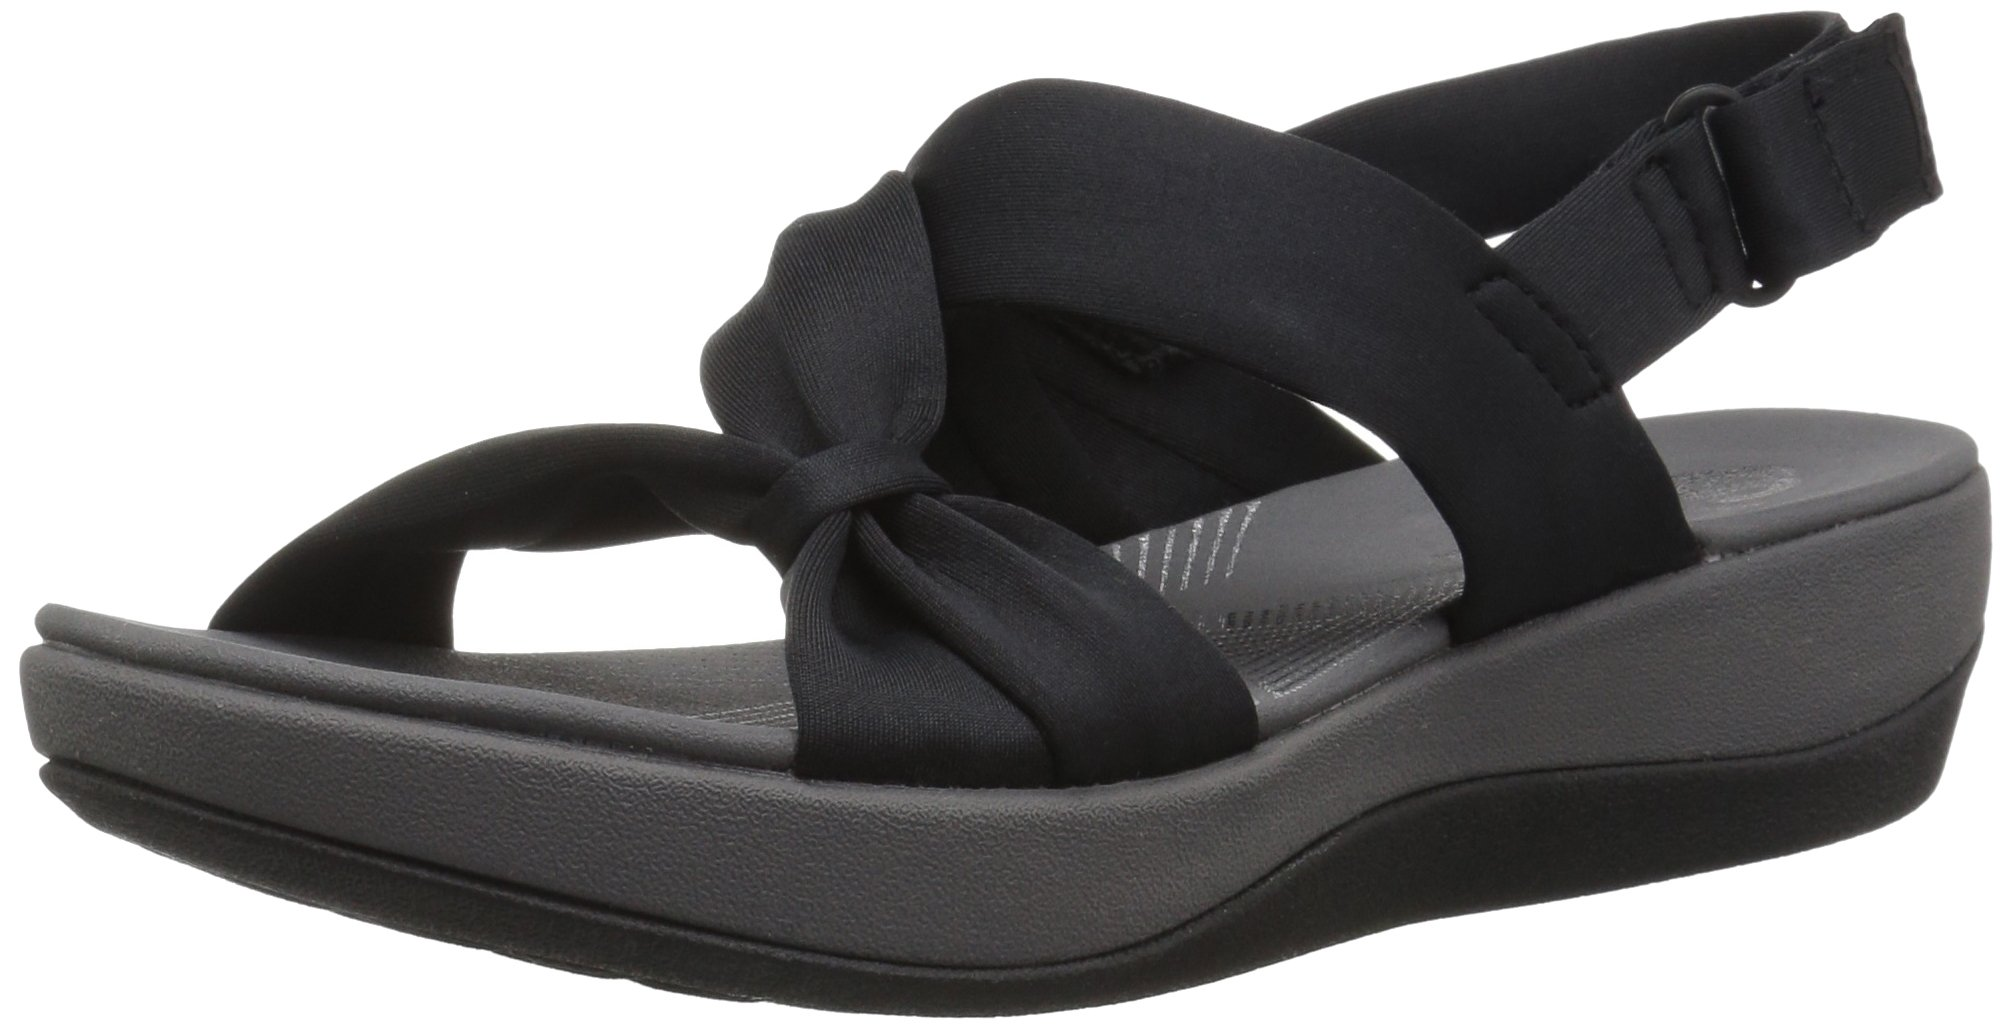 CLARKS Women's Arla Primrose Sandal Black Fabric 12 Wide US